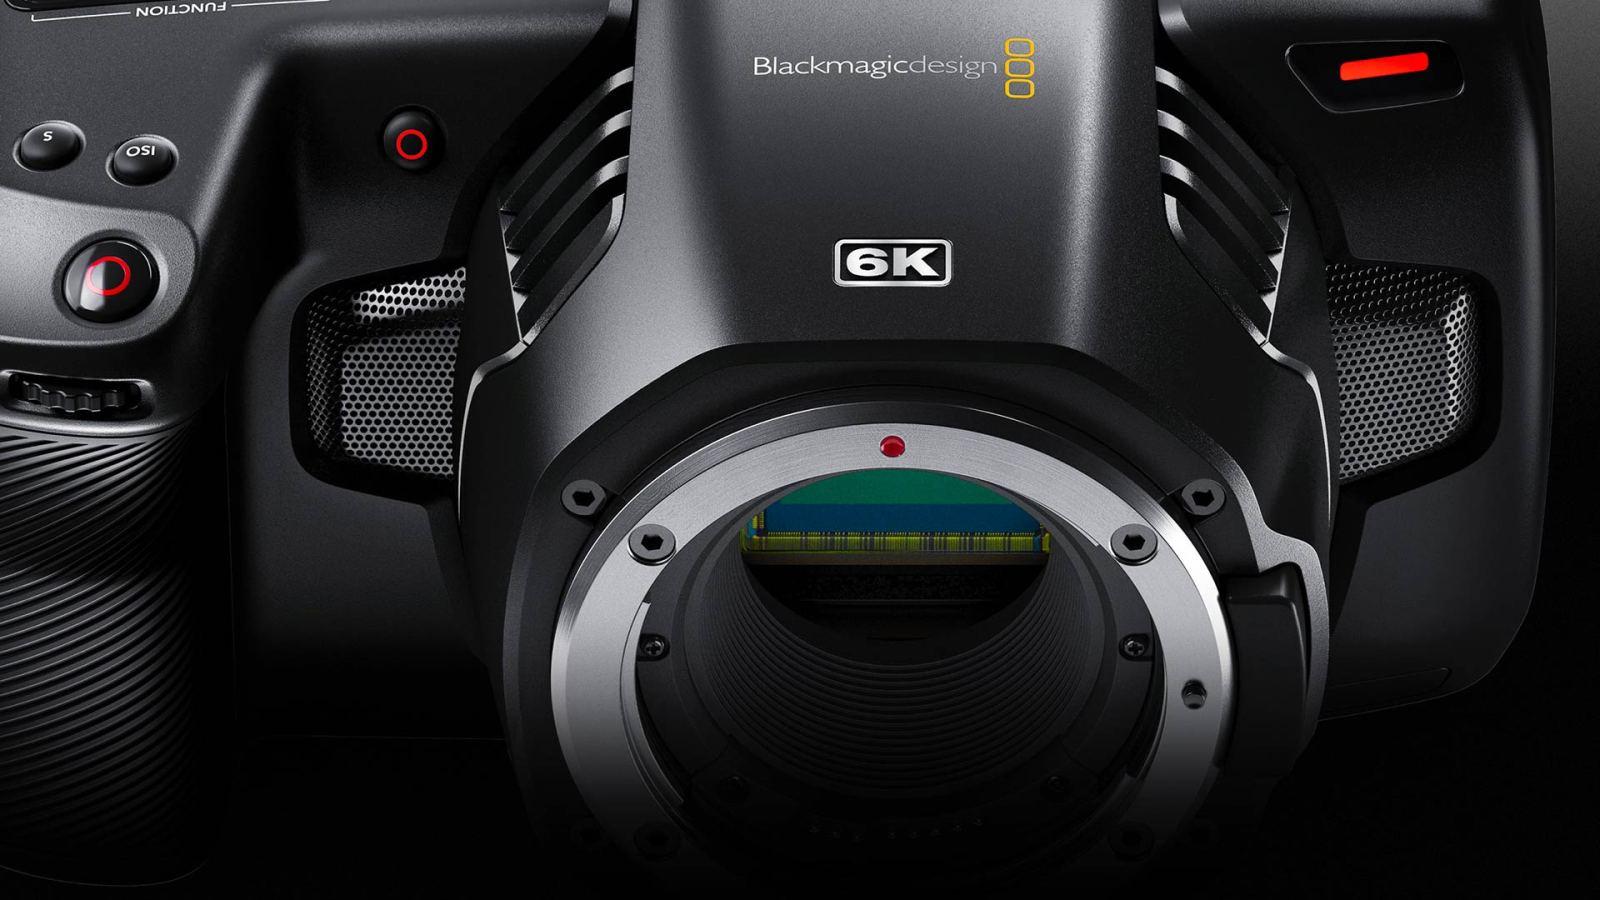 bmpcc 6k blackmagic pocket cinema camera